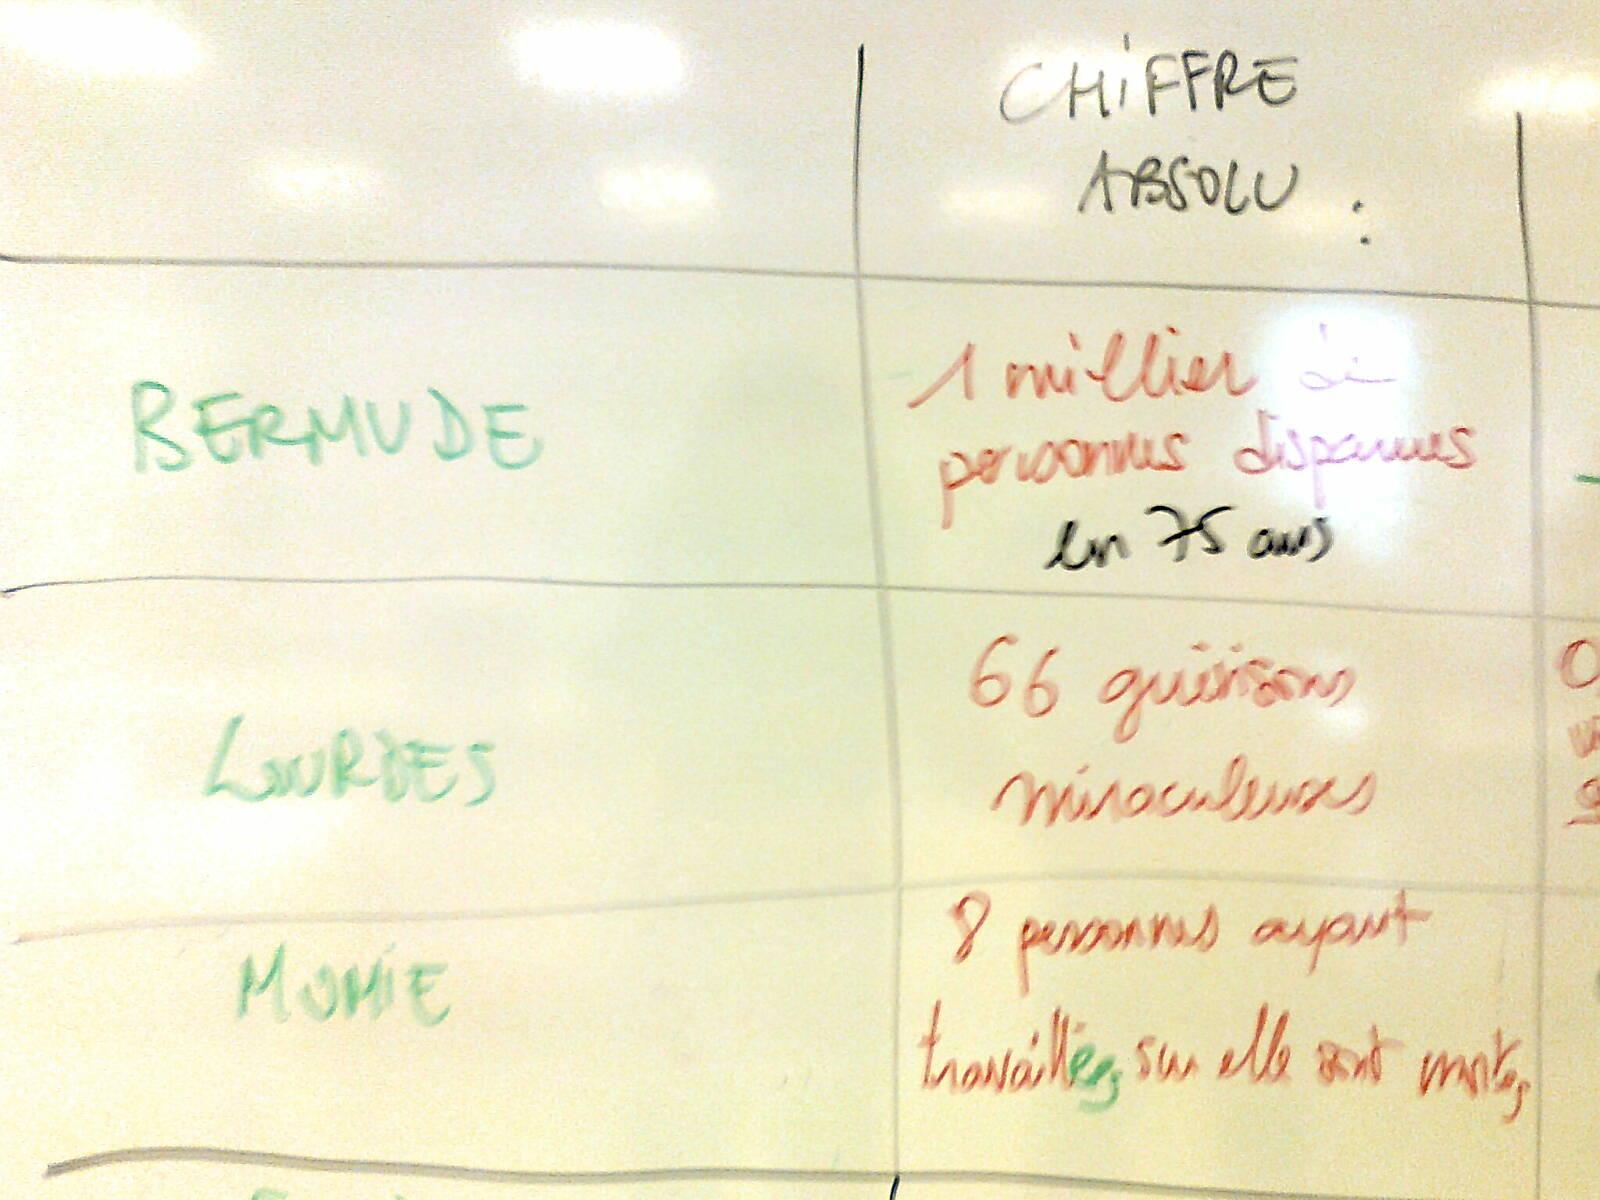 CorteX_Atelier_chiffres_lycee_Doisneau_Tableau_recapitulatif_1